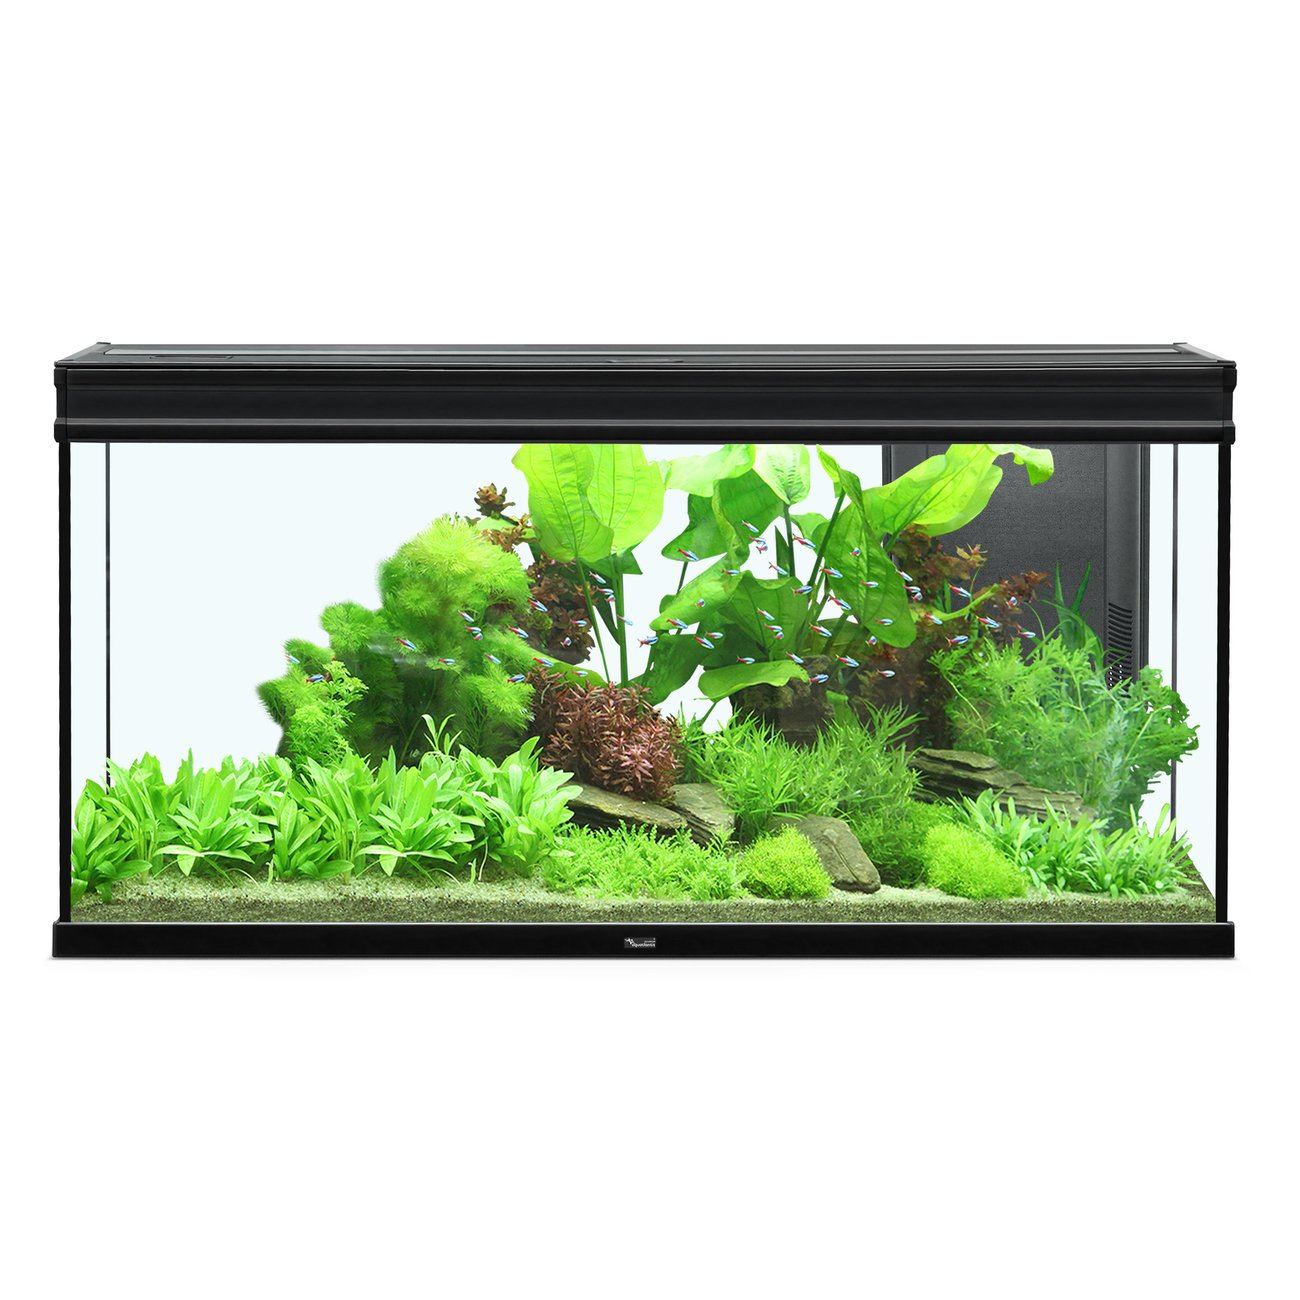 Aquatlantis Elegance Expert 120 Aquarium